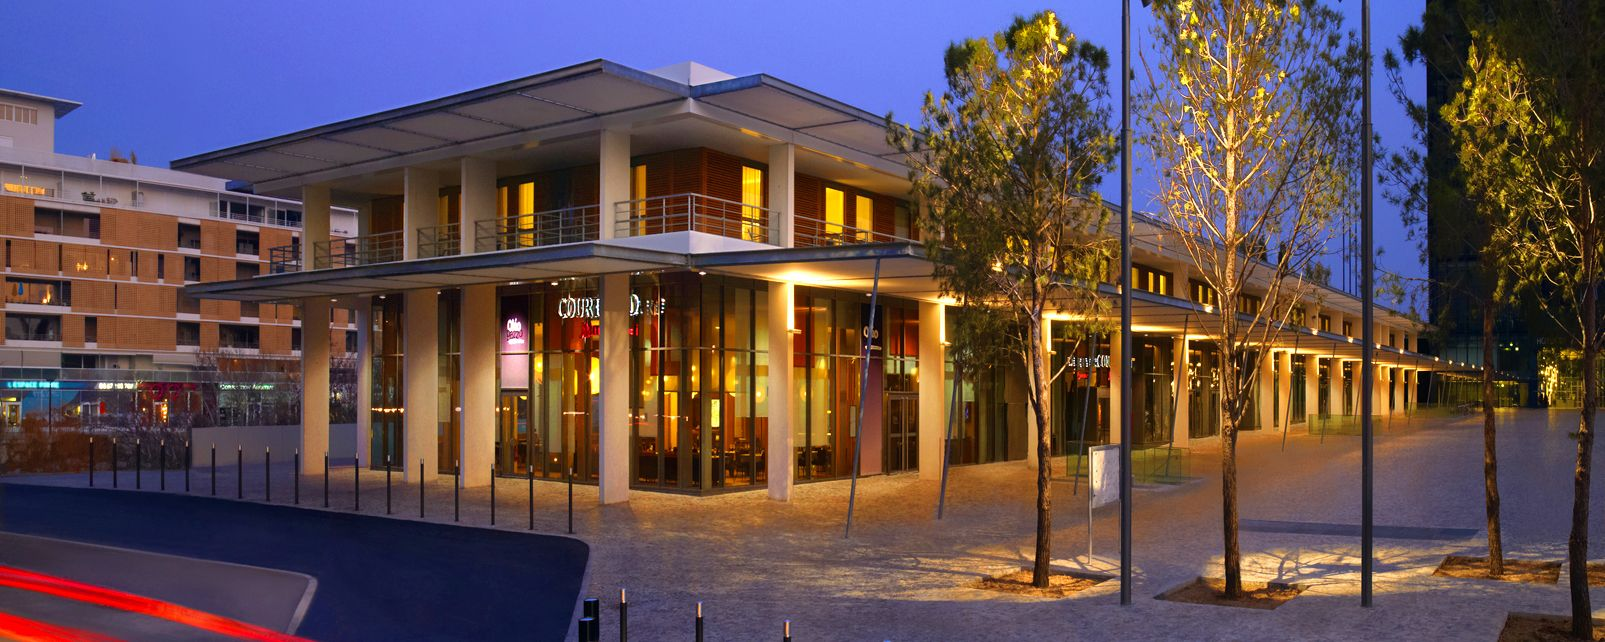 H tel marriott courtyard montpellier france for Hotels montpellier